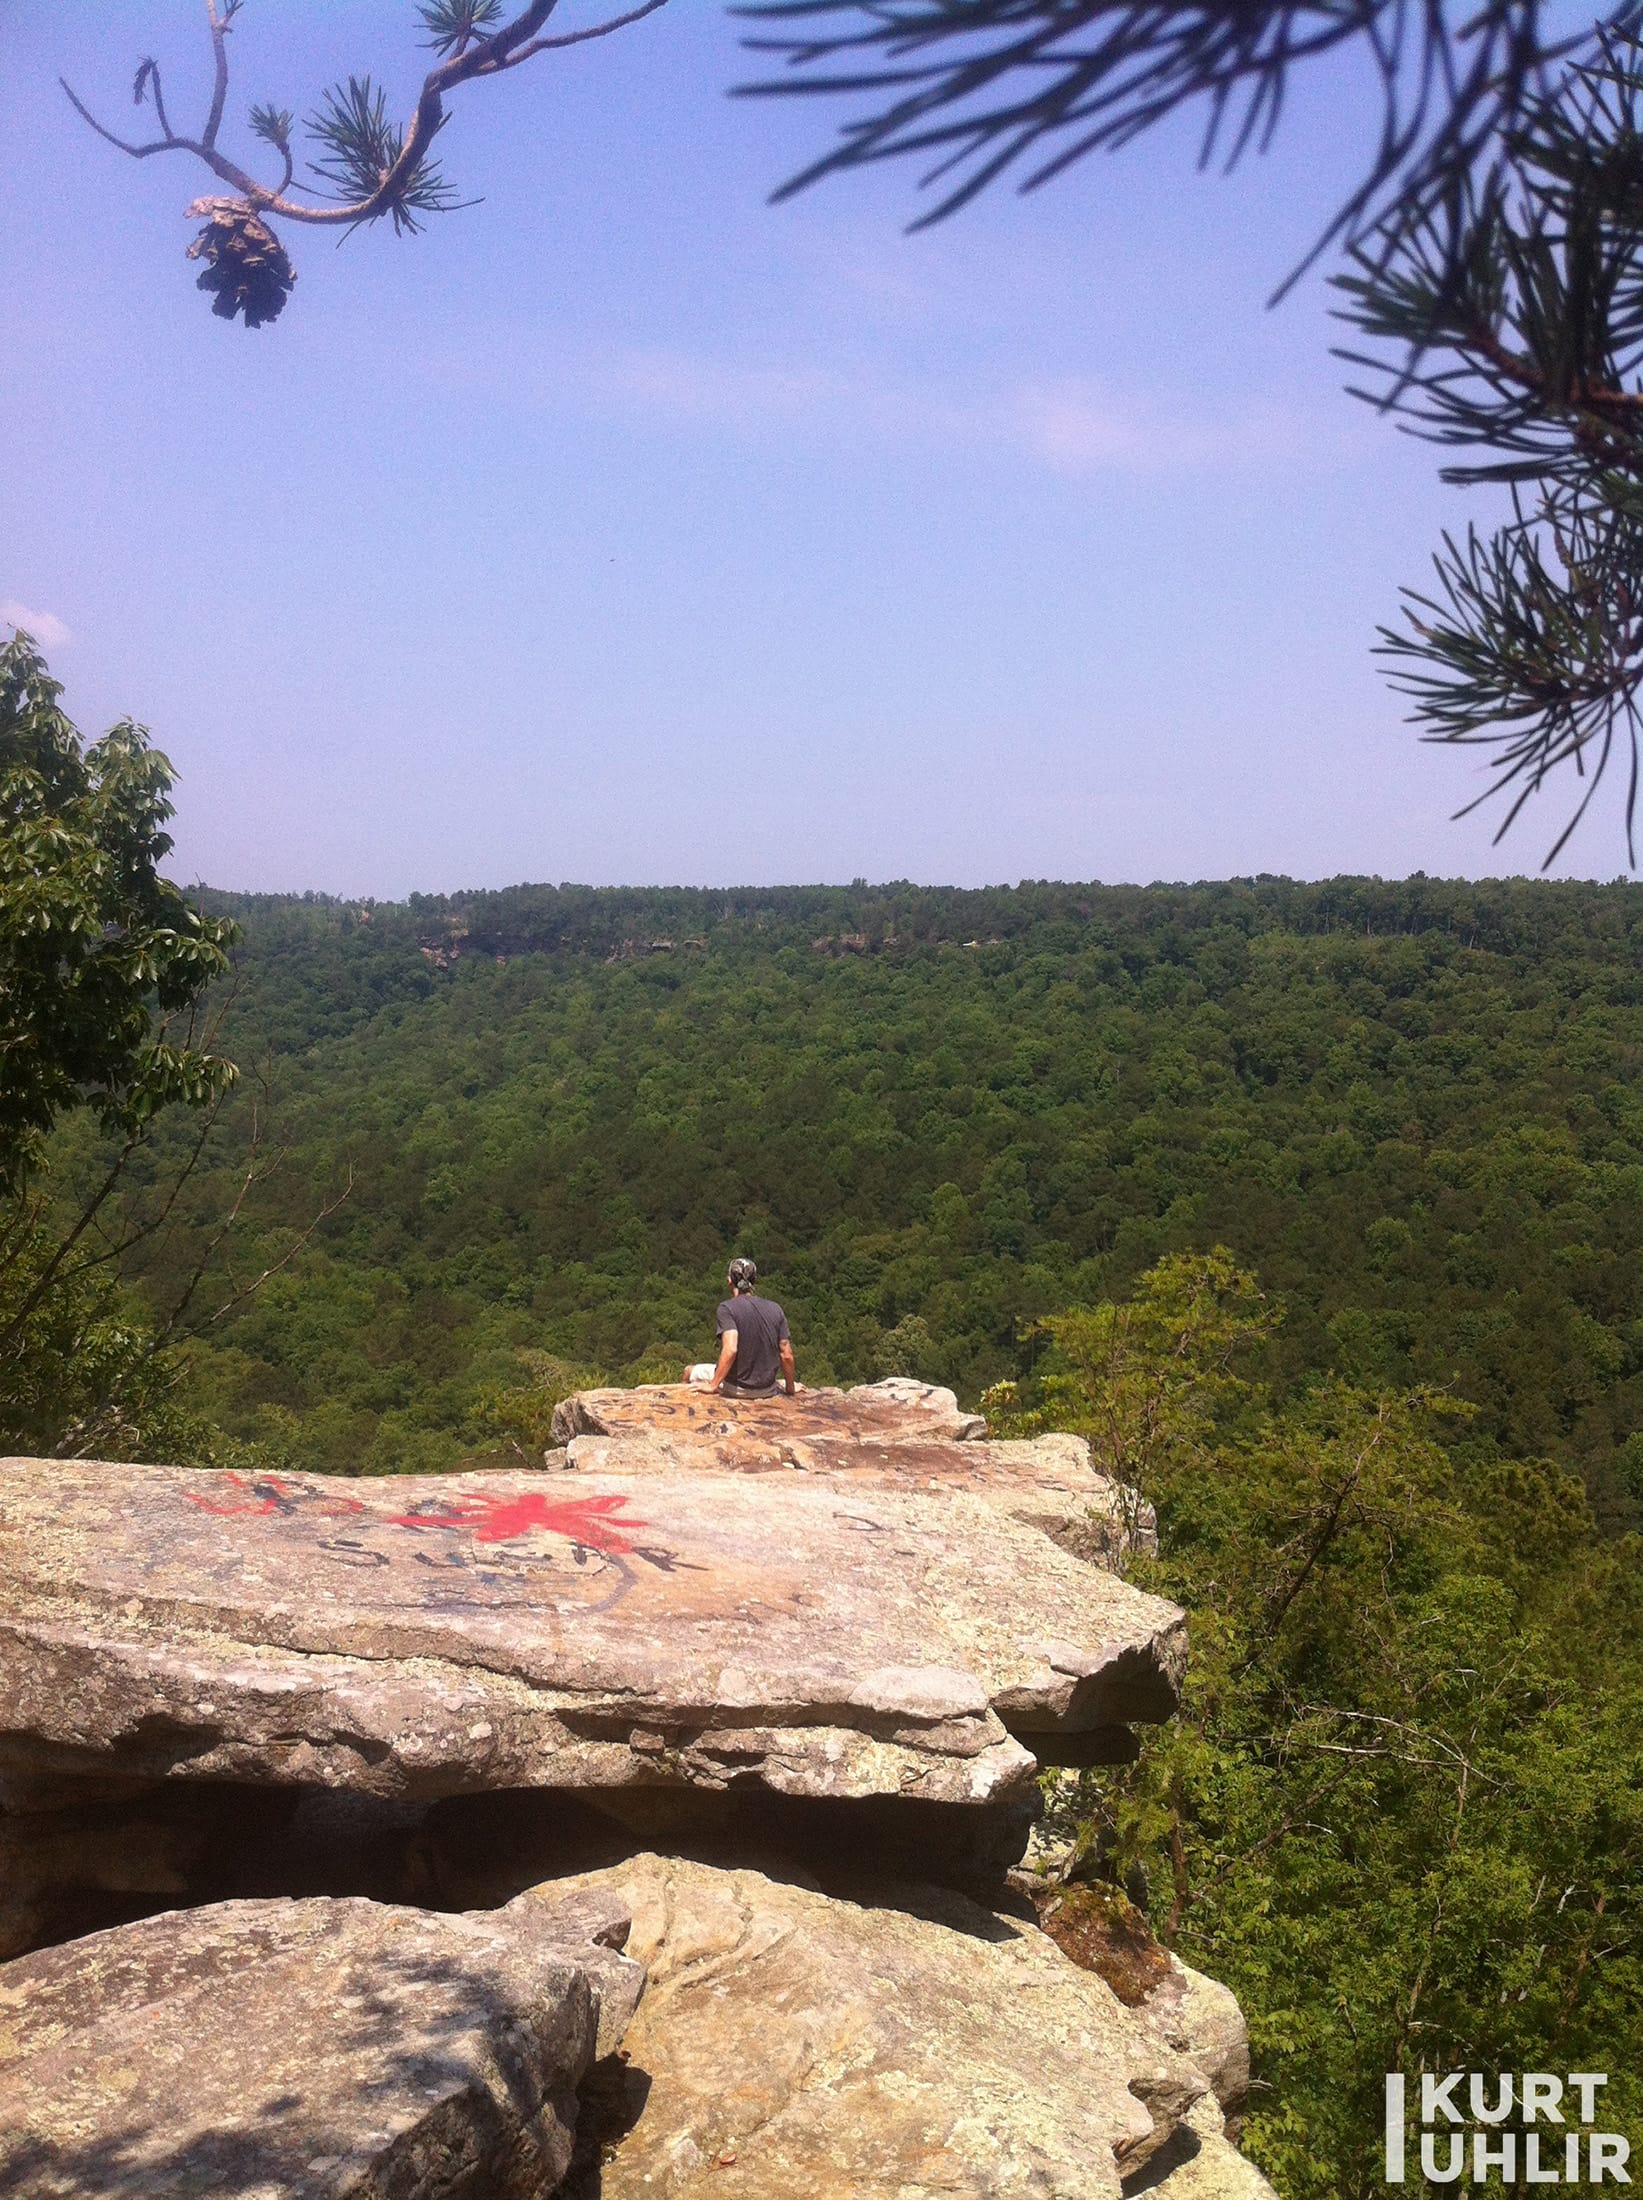 Kurt Uhlir sitting on cliff at Bucks Pocket State Park in Alabama